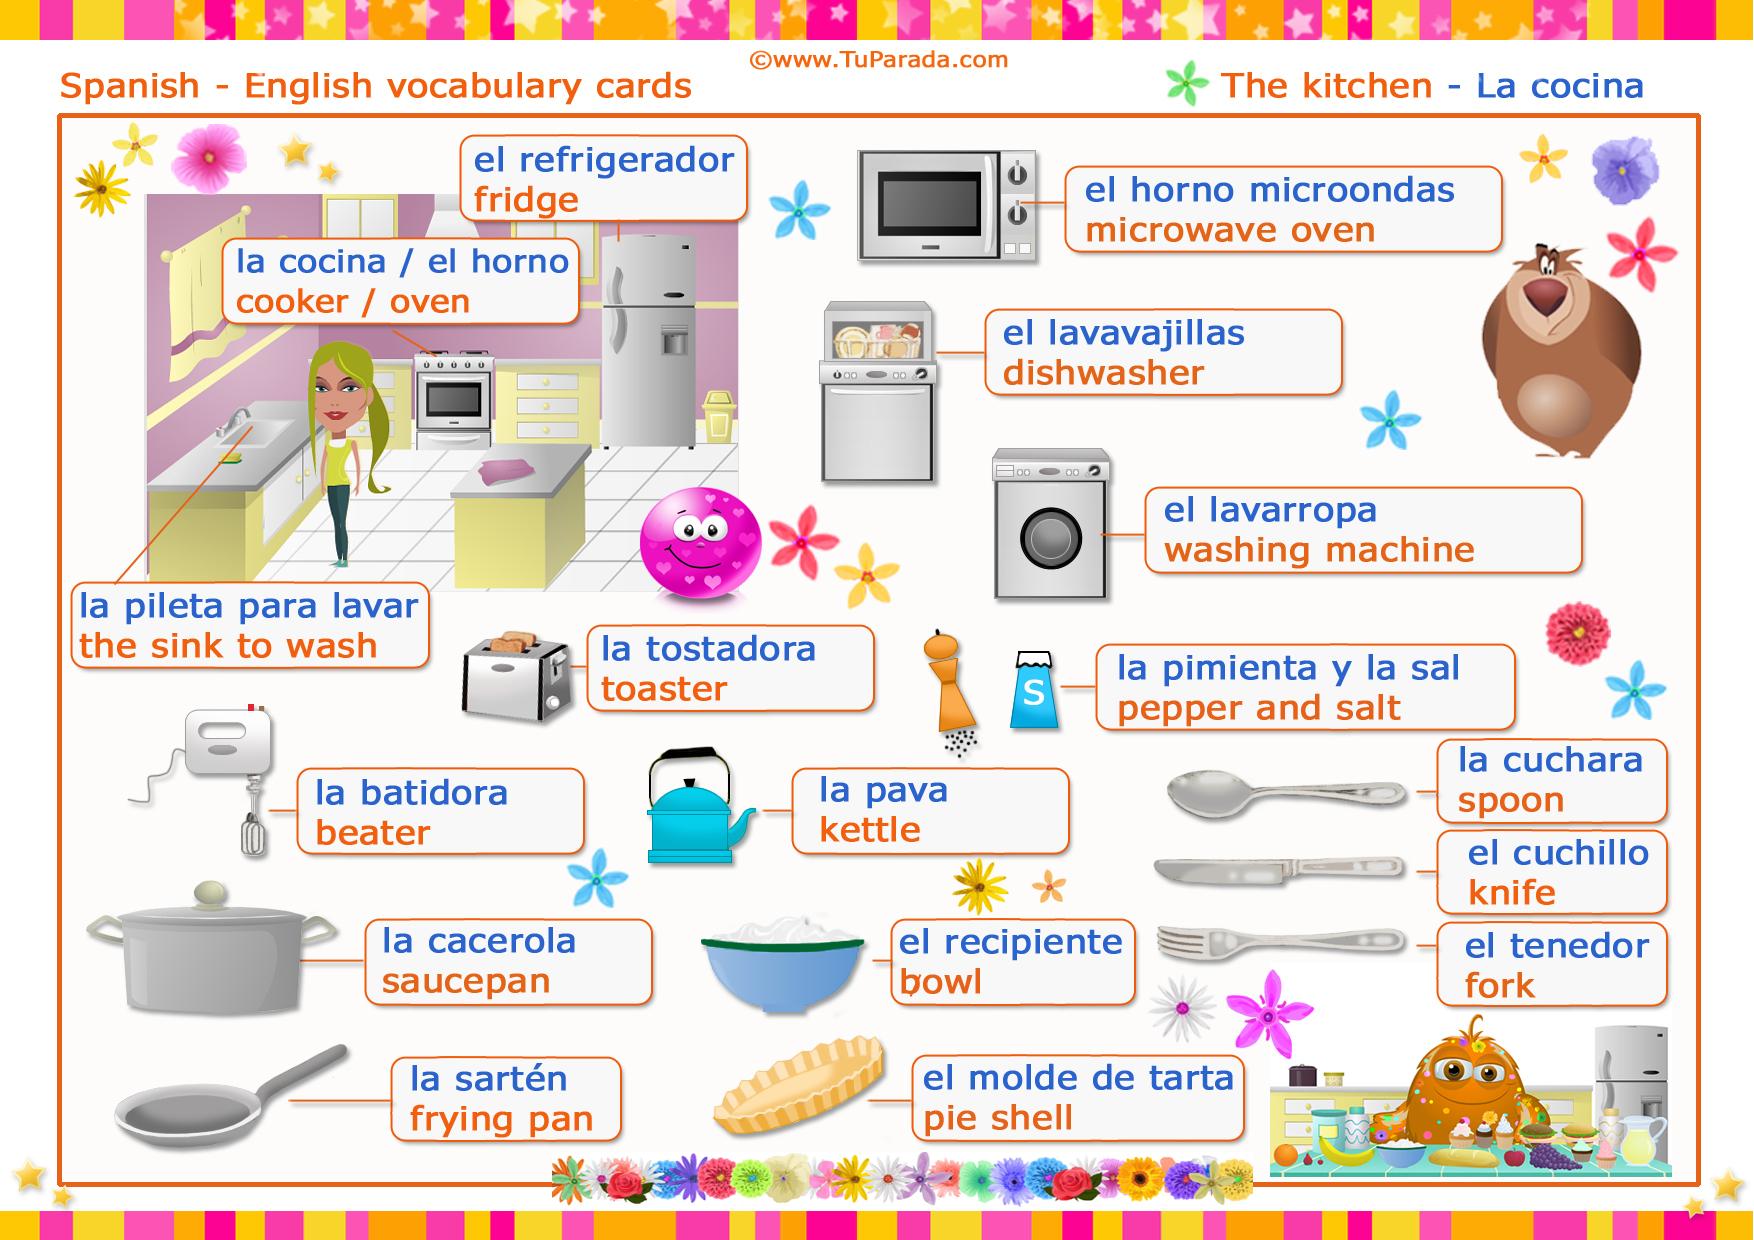 Vocabulario Cocina Kitchen Vocabulario Espanol Ingles